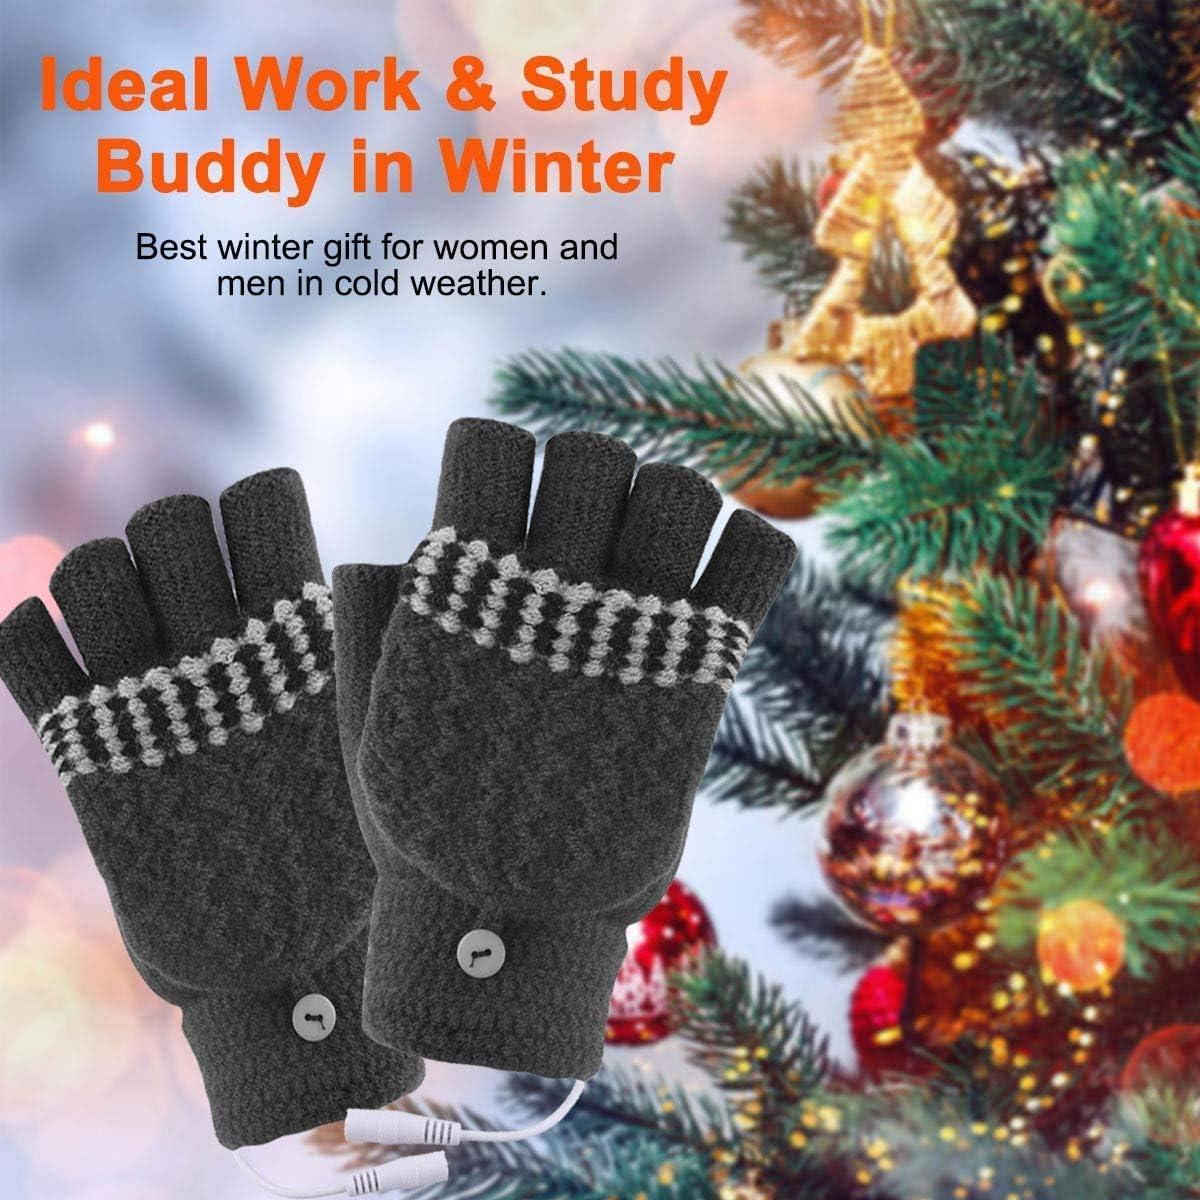 USB Heated Gloves for Women & Men, Hand Warmer Gloves for Typing Winter Warm Laptop Gloves, Full & Half Hands Heated Fingerless Gloves Mitten Washable Design